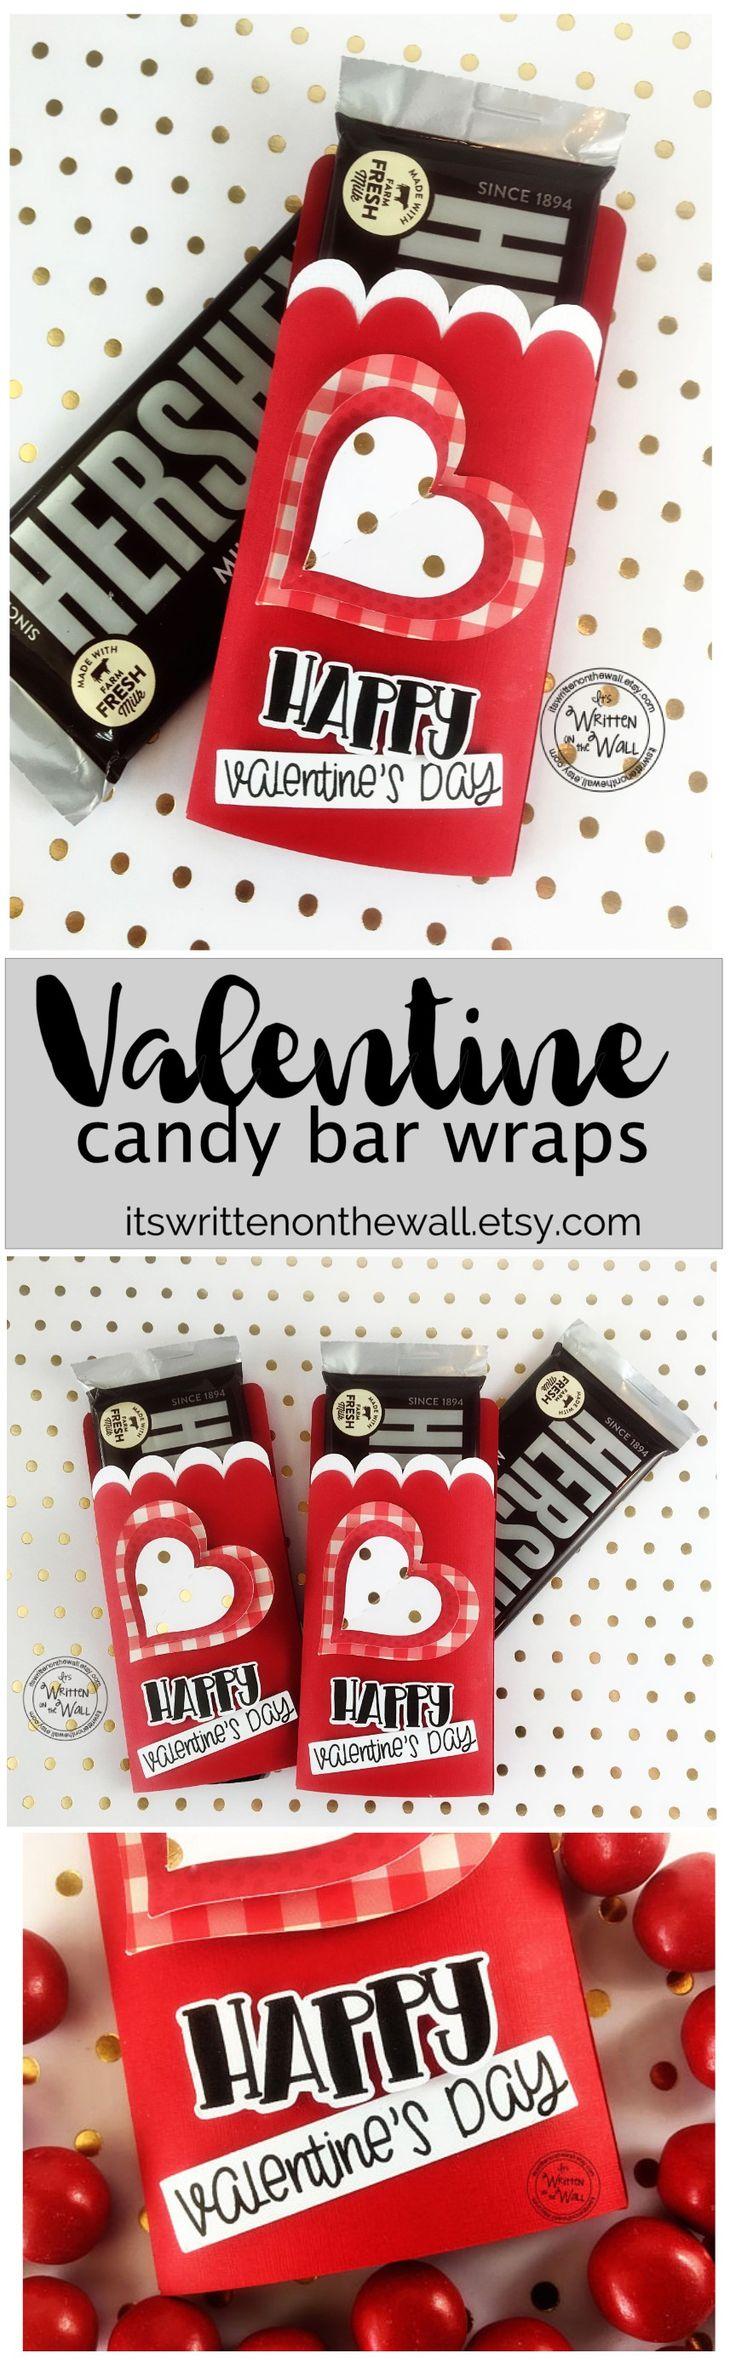 474 best Valentines Day Fun images on Pinterest   Valantine day ...